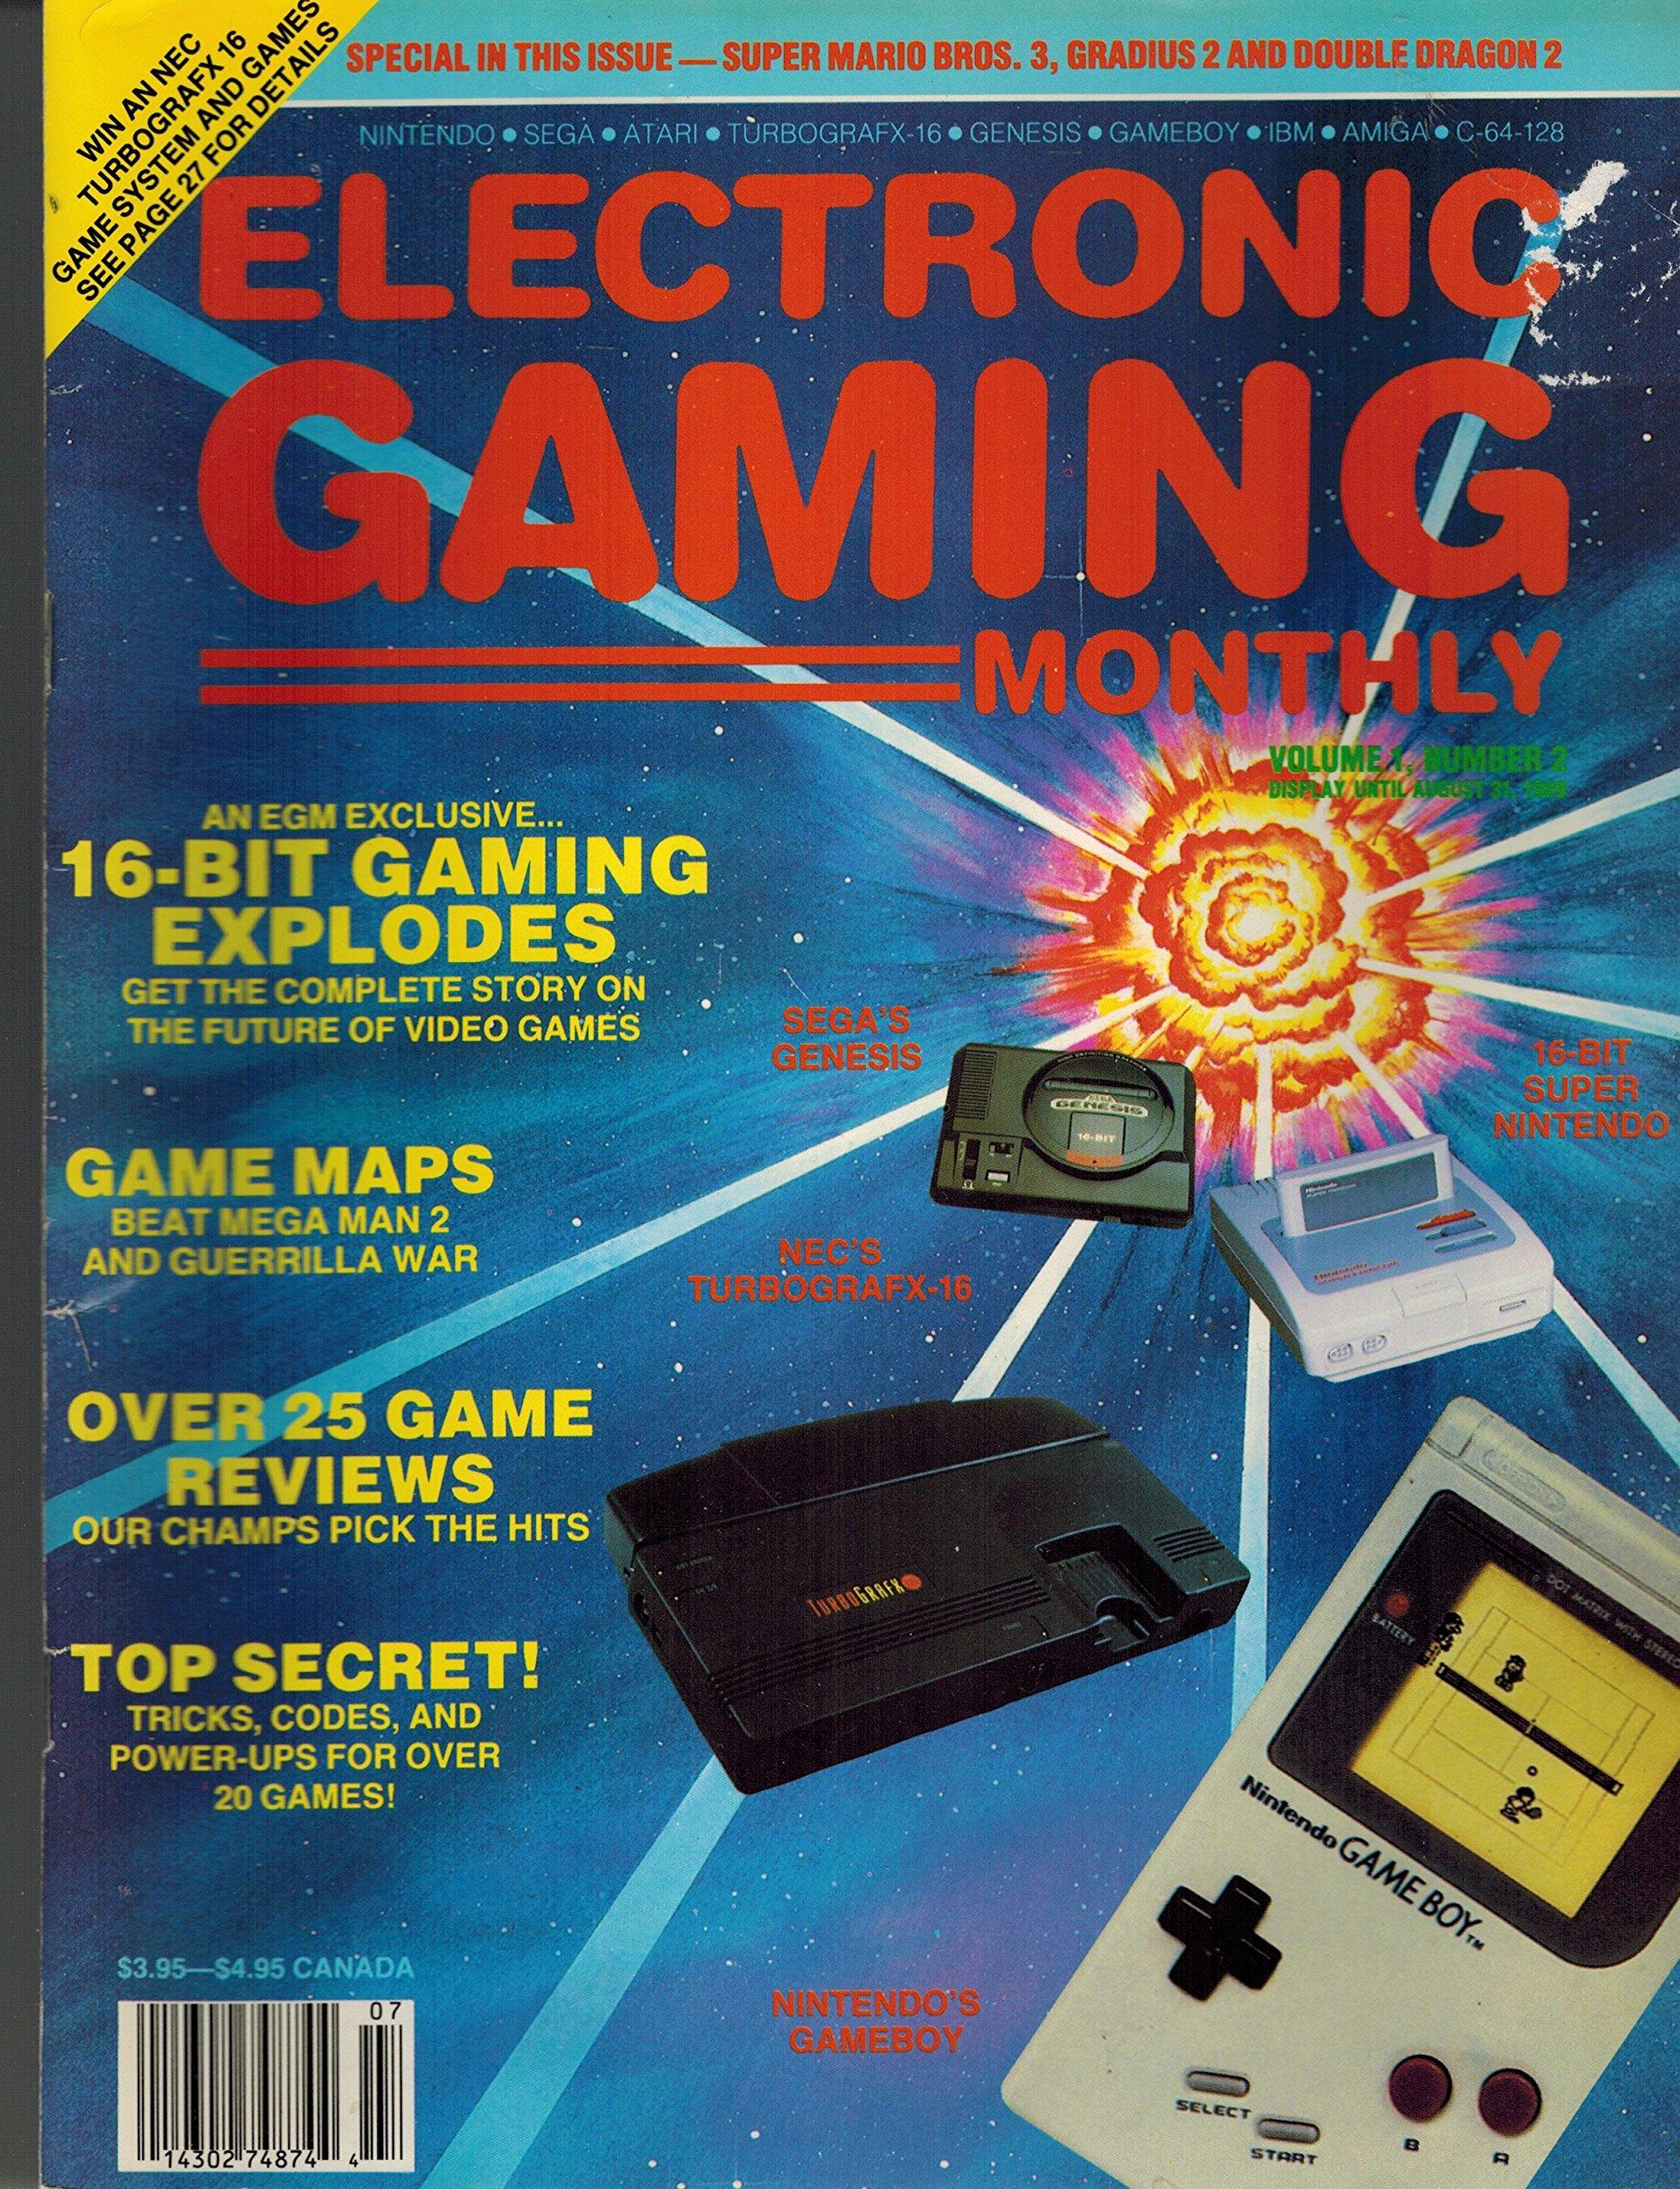 Electronic Gaming Monthly (Volume 1): Steve Harris: Amazon.com: Books